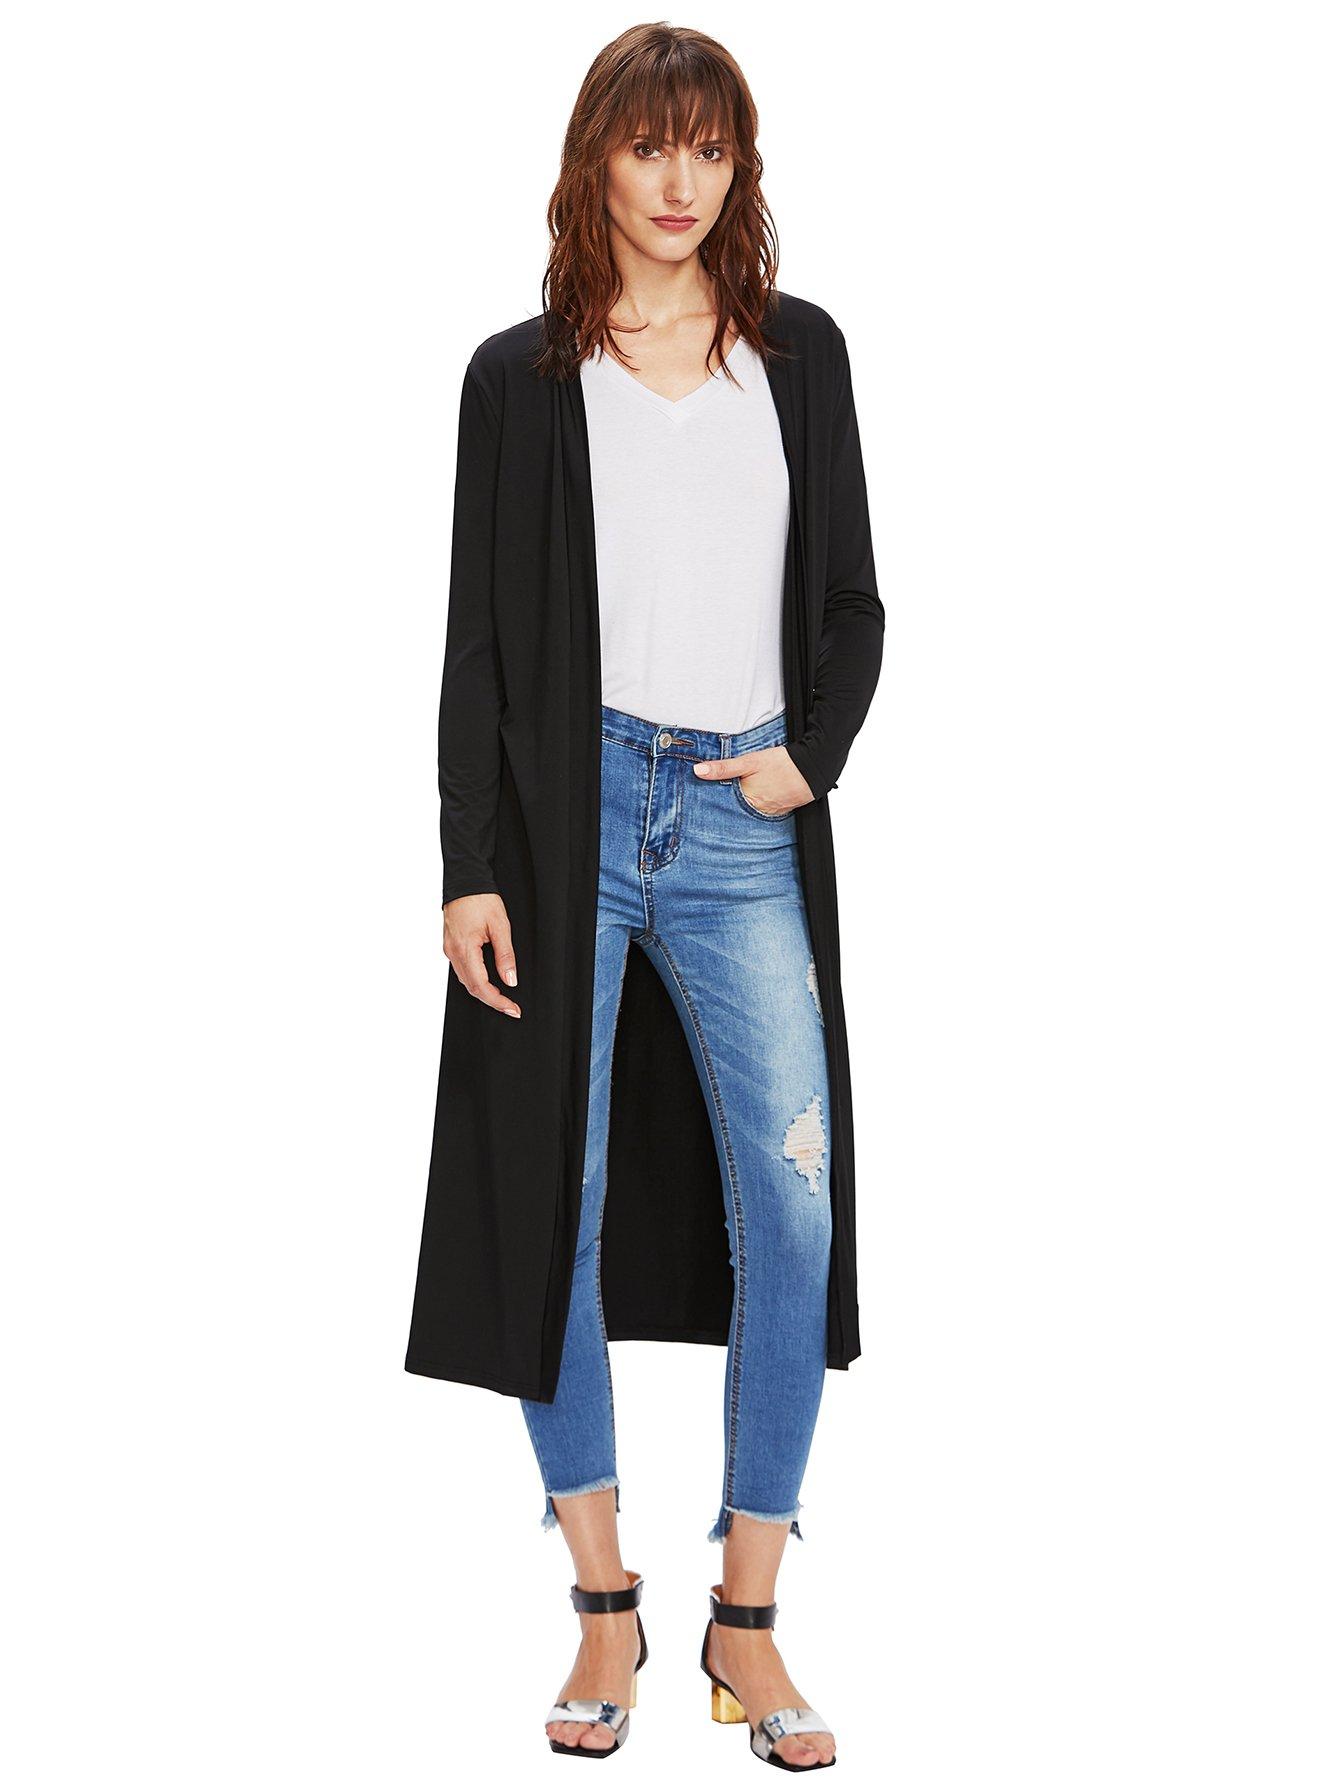 Verdusa Women's Long Sleeve Open Front Long Maxi Cardigan Longline Duster Coat Black M by Verdusa (Image #5)